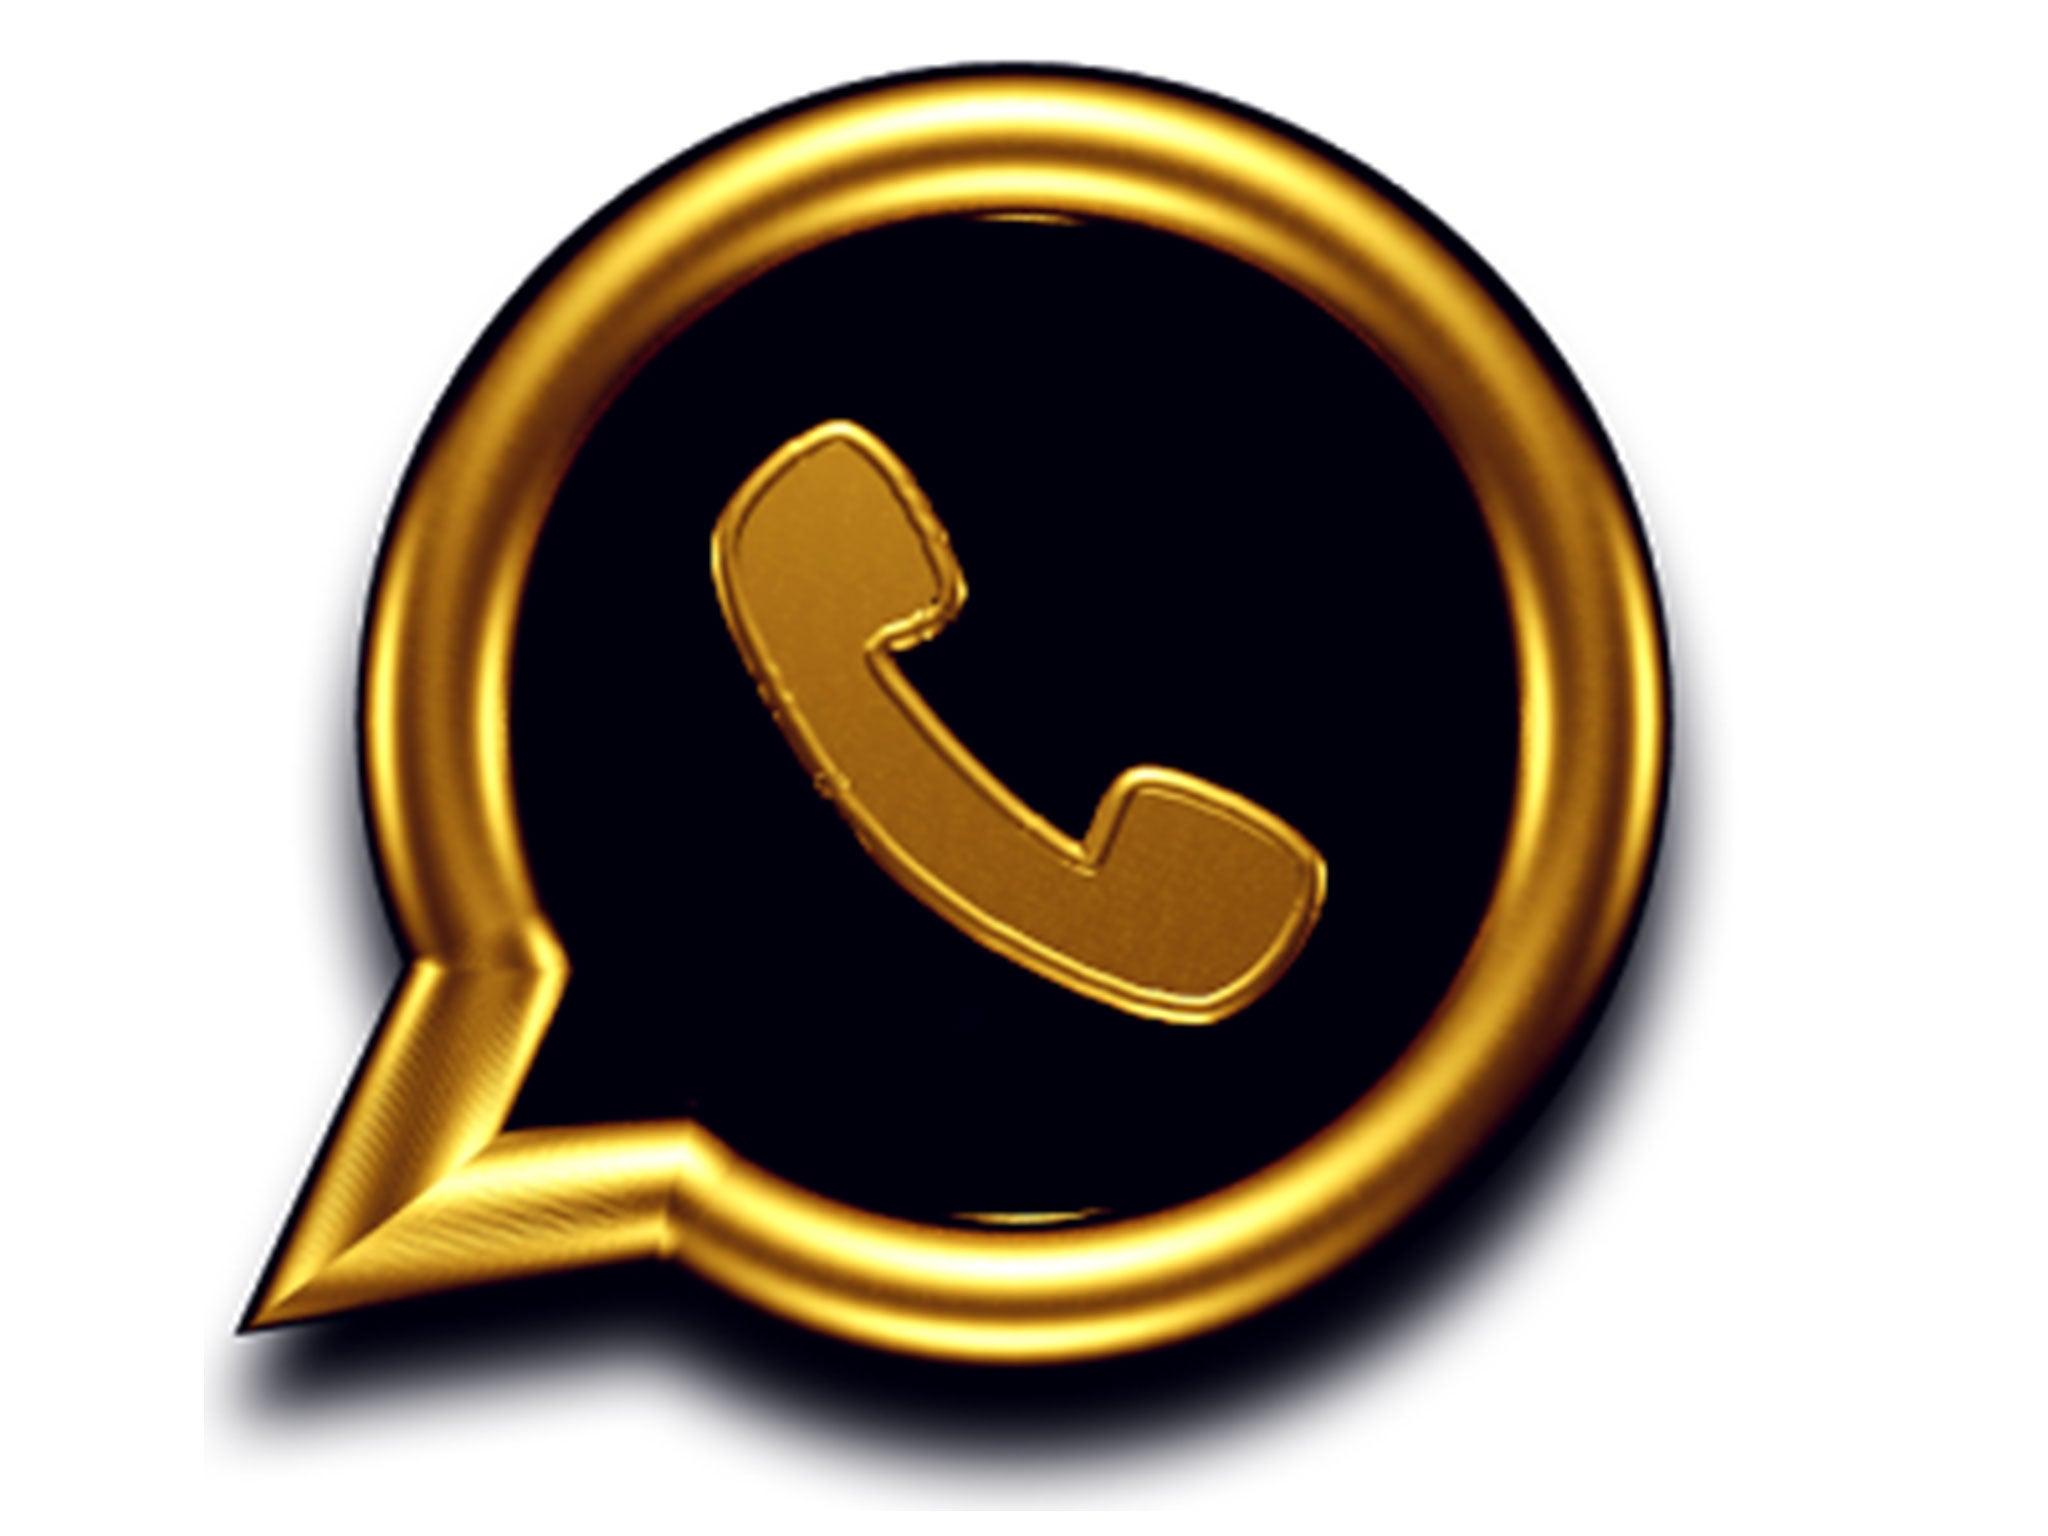 صور شعار واتس اب png جديدة